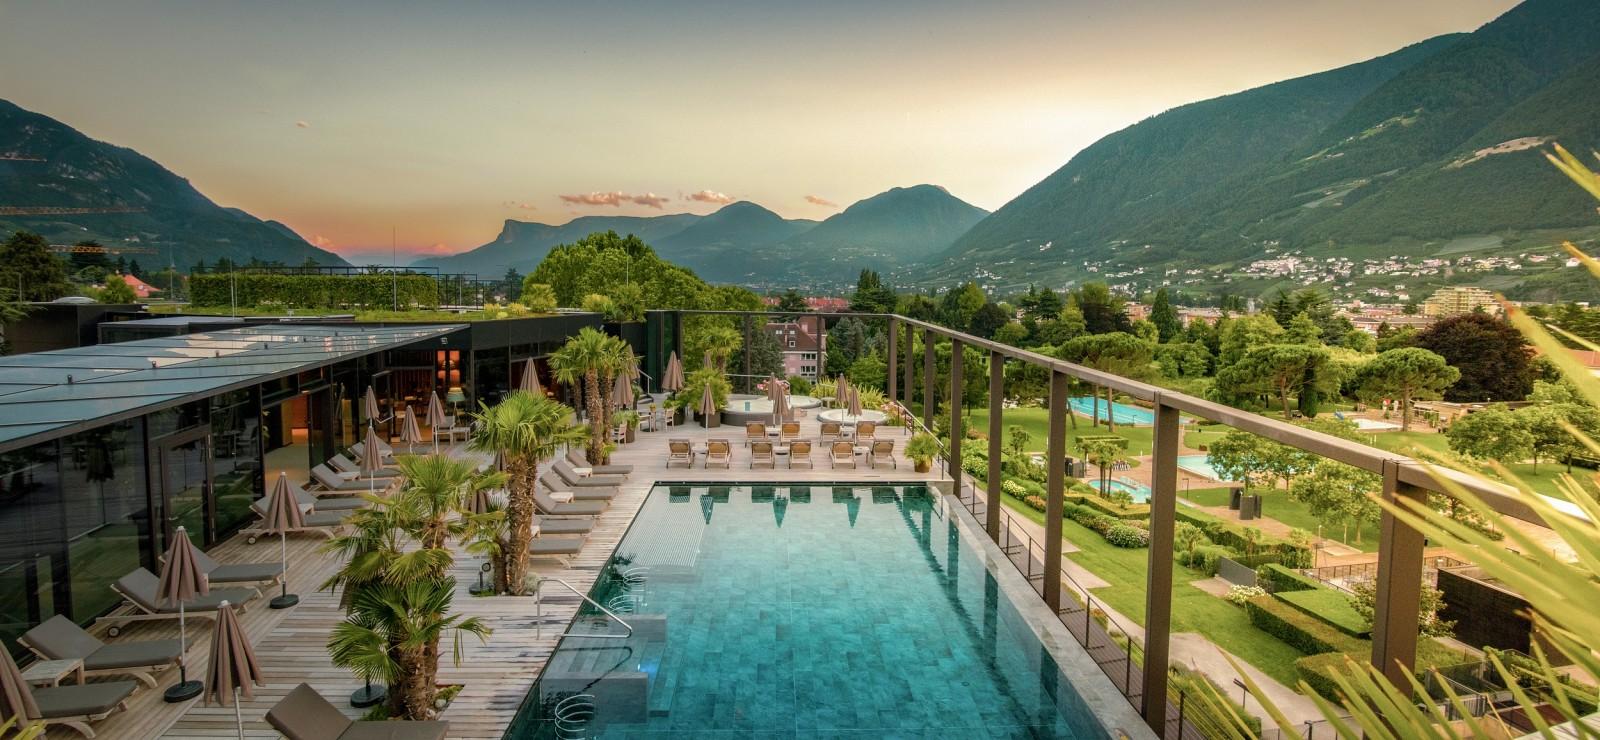 Hotel Therme Meran Bilder | Bild 1